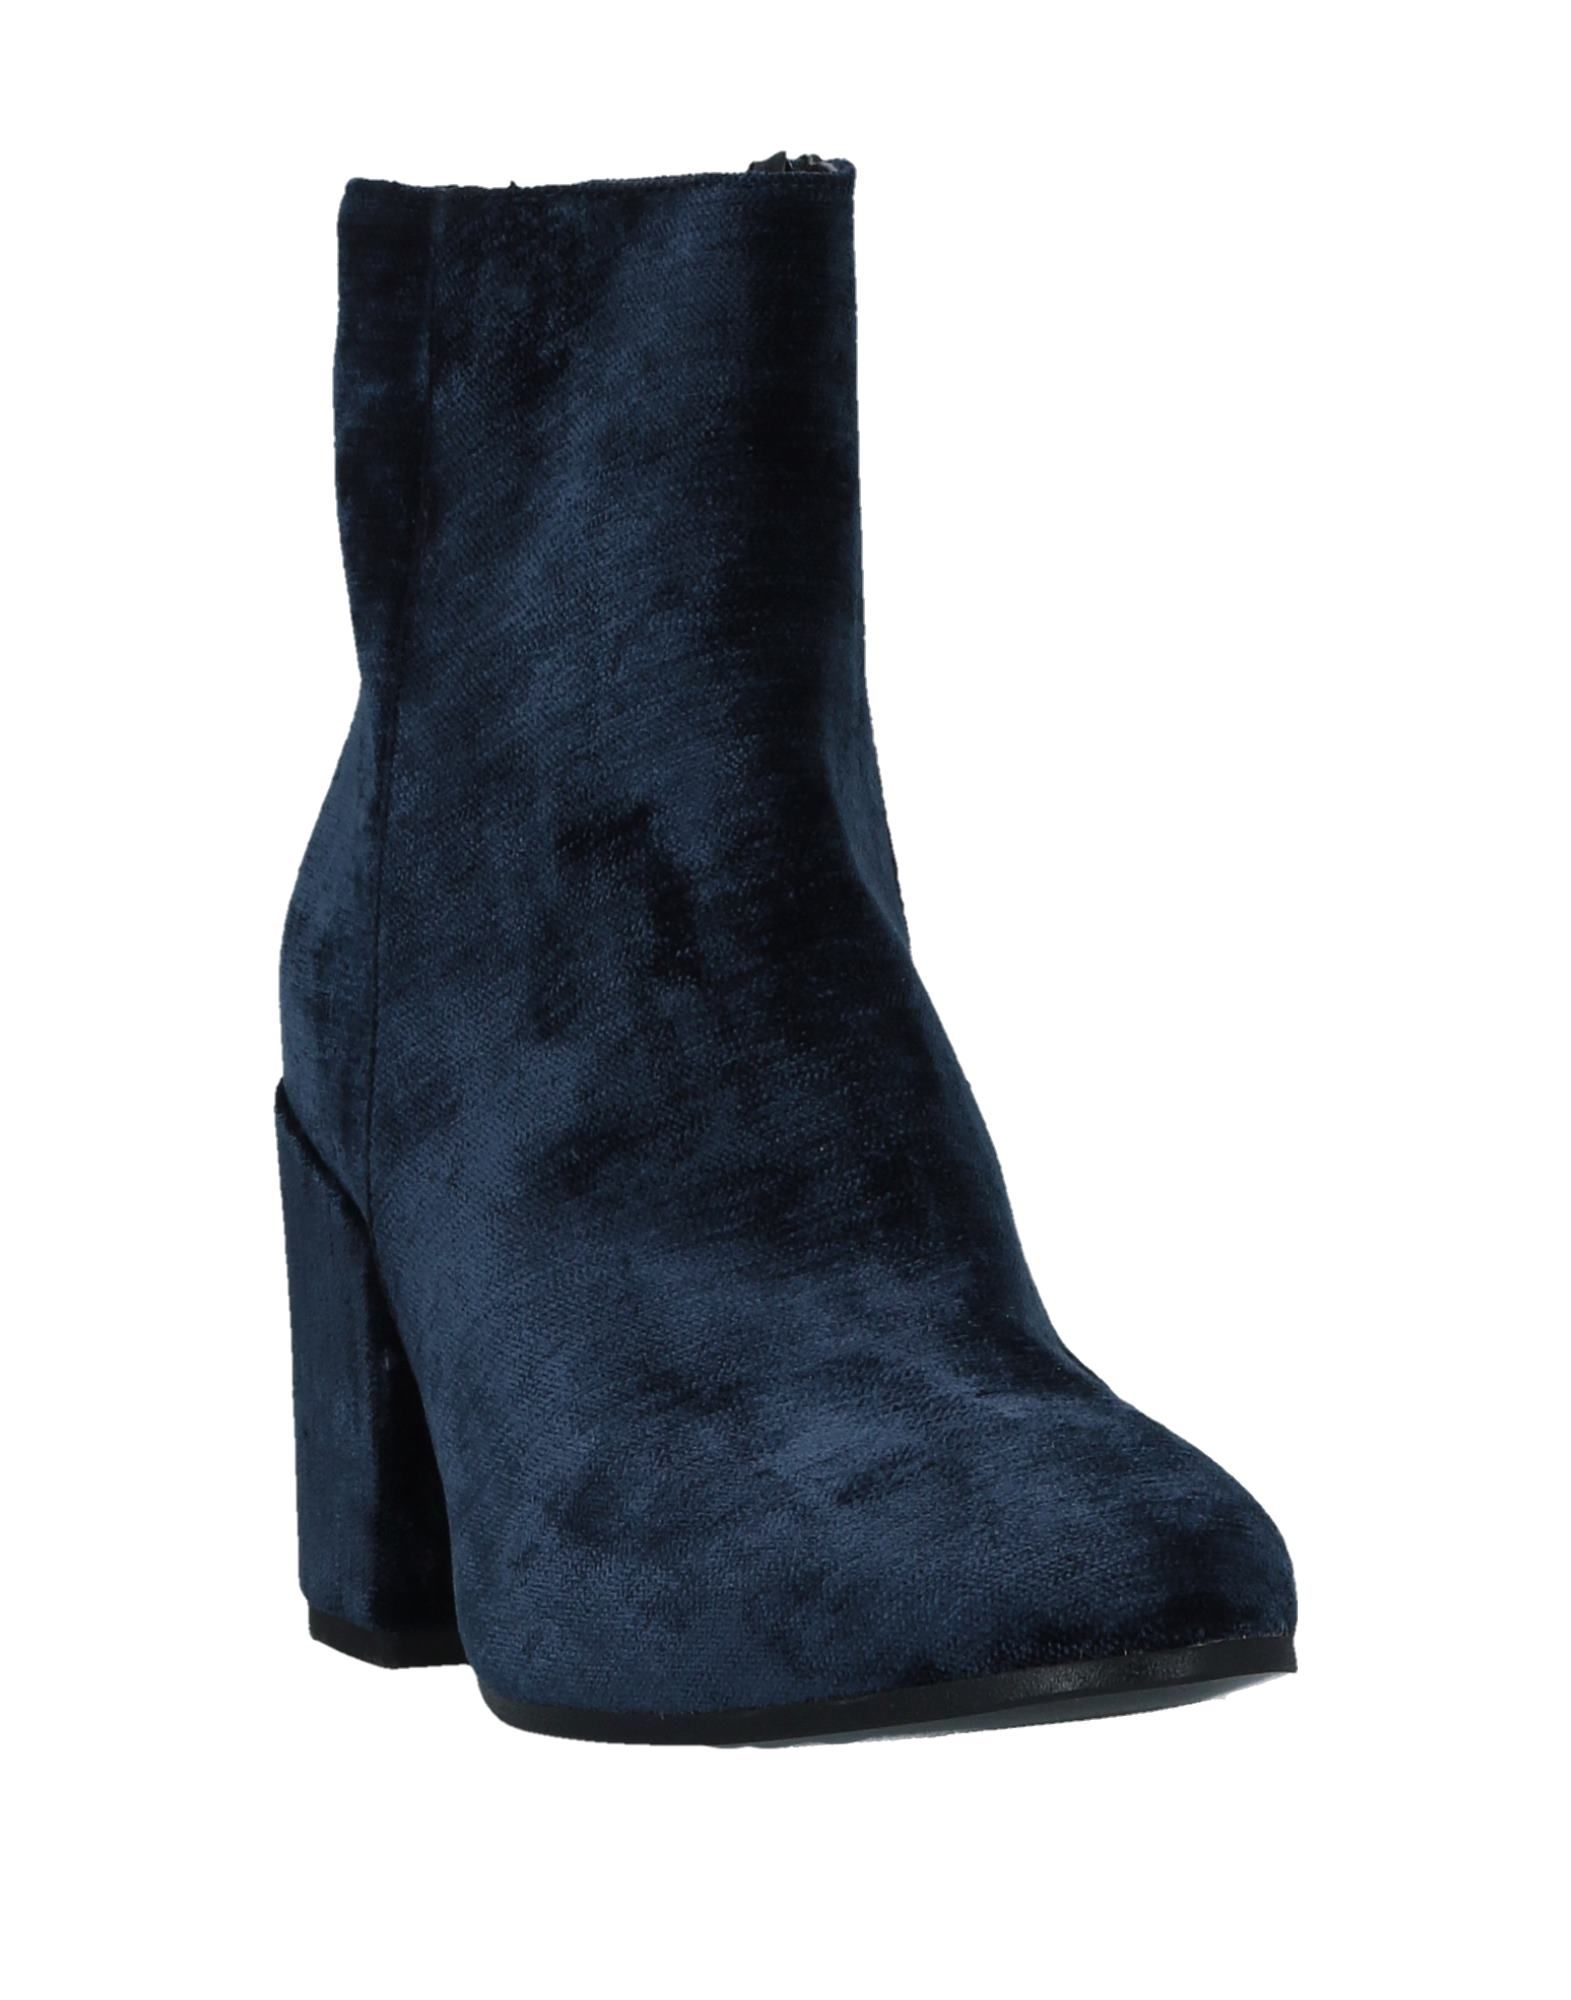 Eliana Bucci Stiefelette Qualität Damen  11532616UV Gute Qualität Stiefelette beliebte Schuhe a9f003